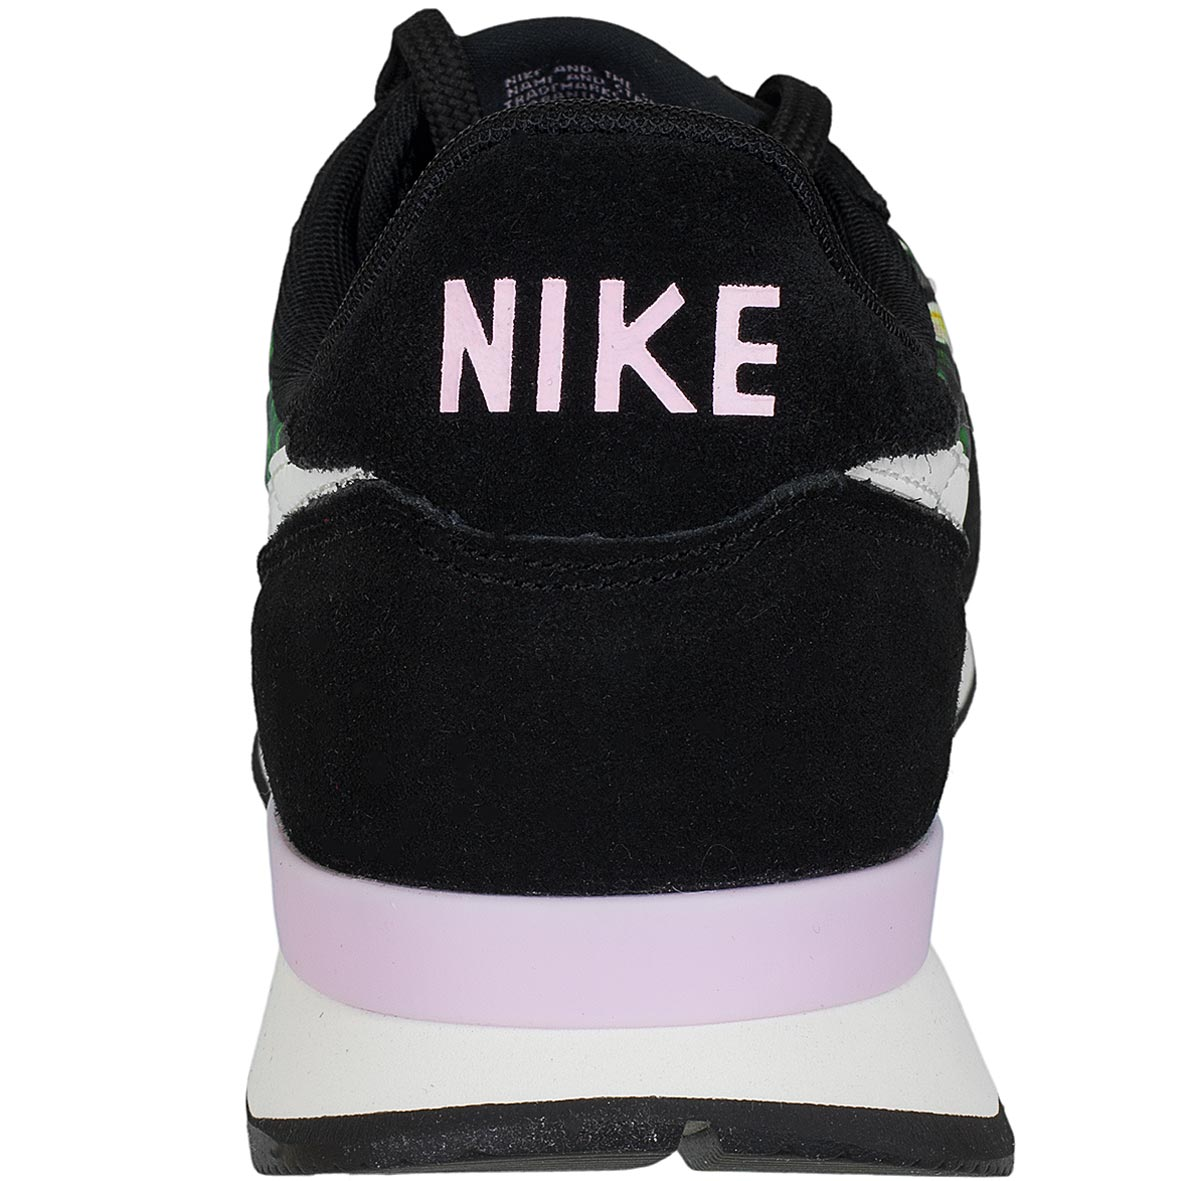 new arrival ce3bb 689ed ... discount code for nike damen sneaker internationalist premium schwarz  weiß af659 4d877